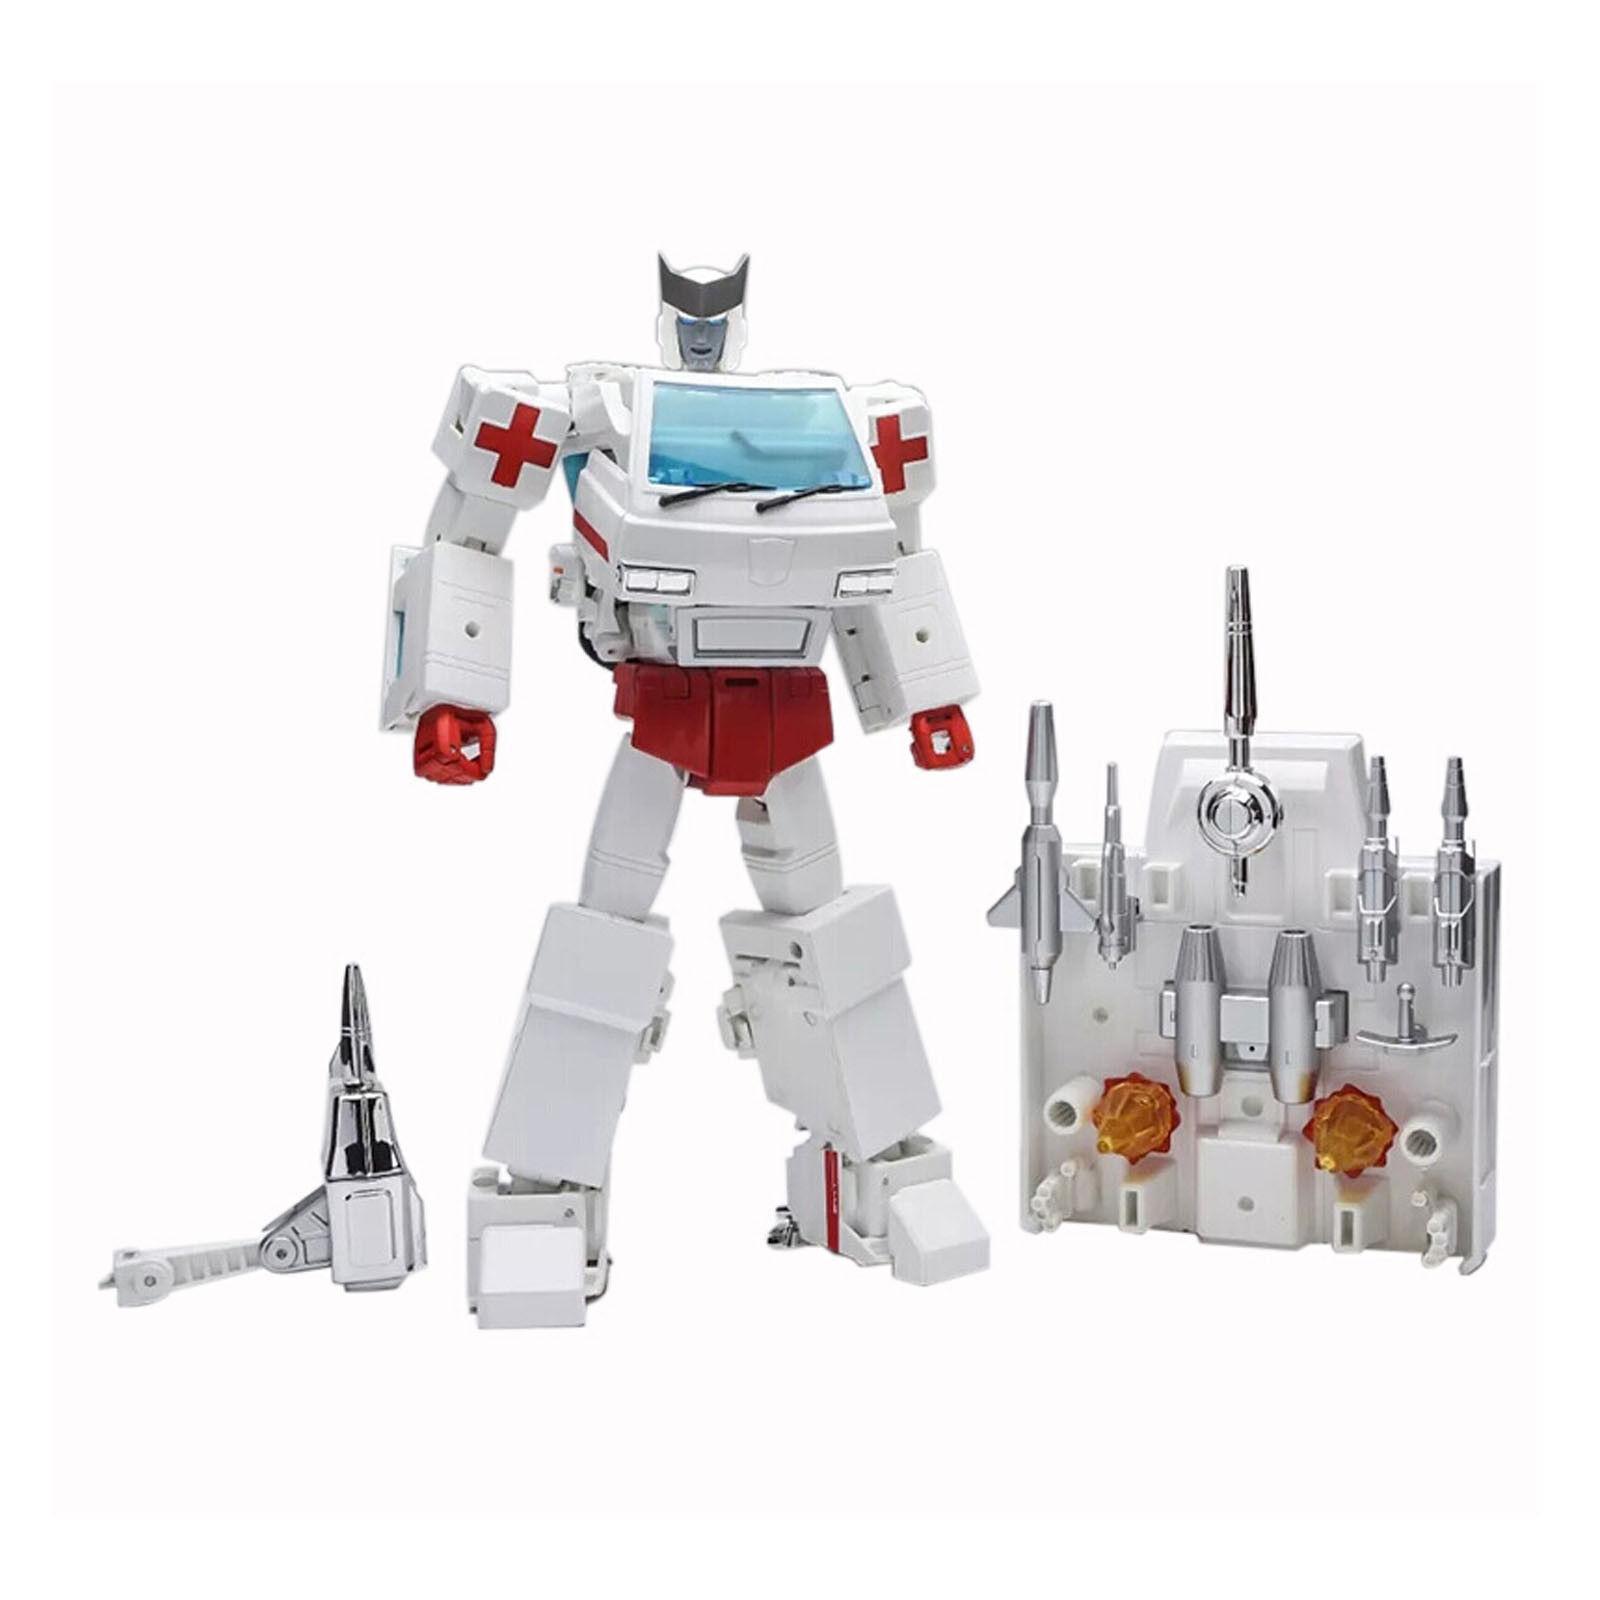 Transformers WJ Weijiang MPP30 Projoector De Acero fuerza Robot Juguete Regalo Chrismas